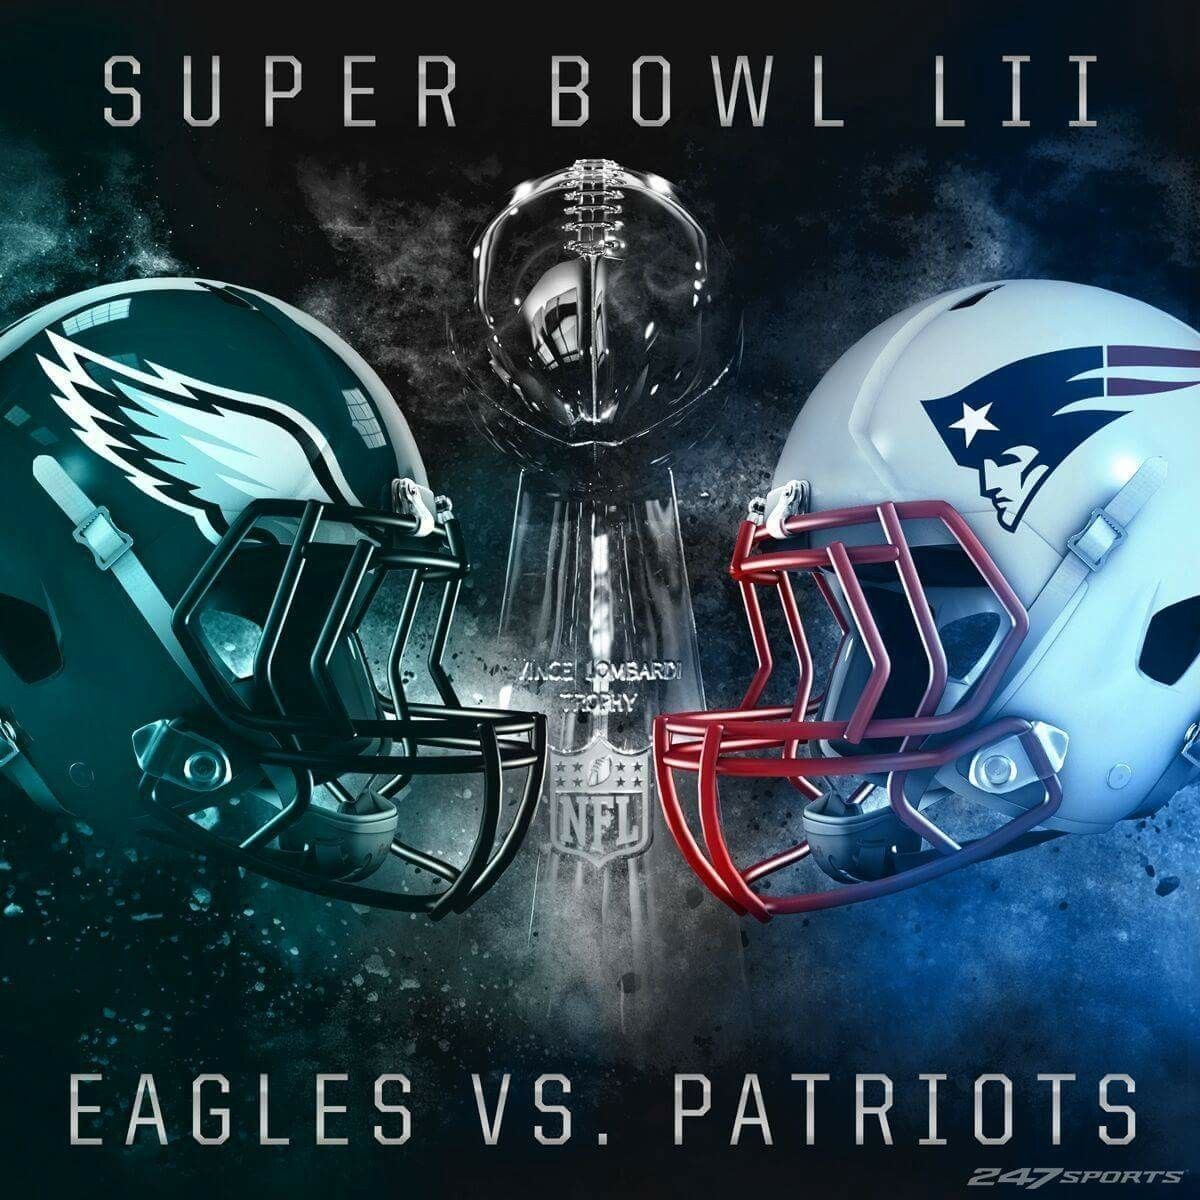 Pin By Kathleen Comas On Patriot Dynasty Patriots Philadelphia Eagles Eagles Football